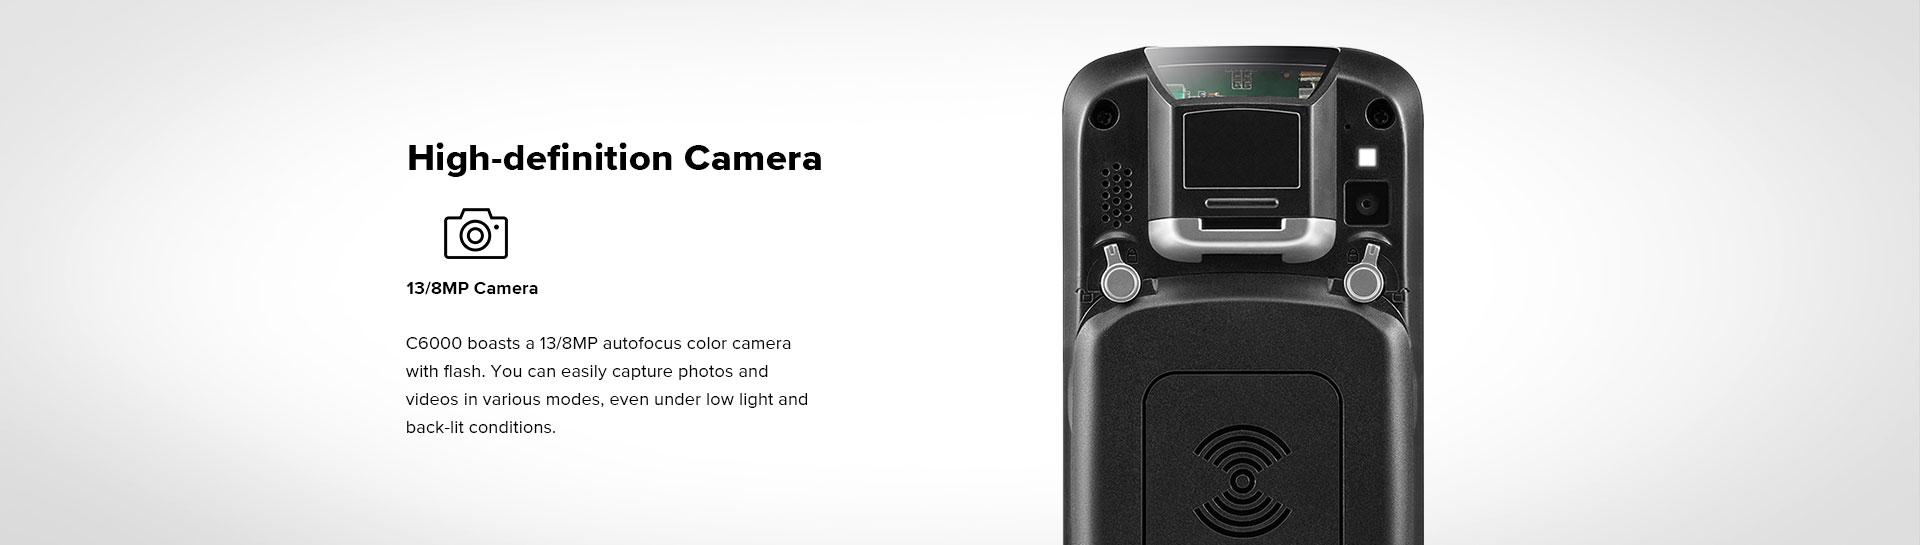 C6000 Rugged Handheld Computer Android - 13/8 MP camera